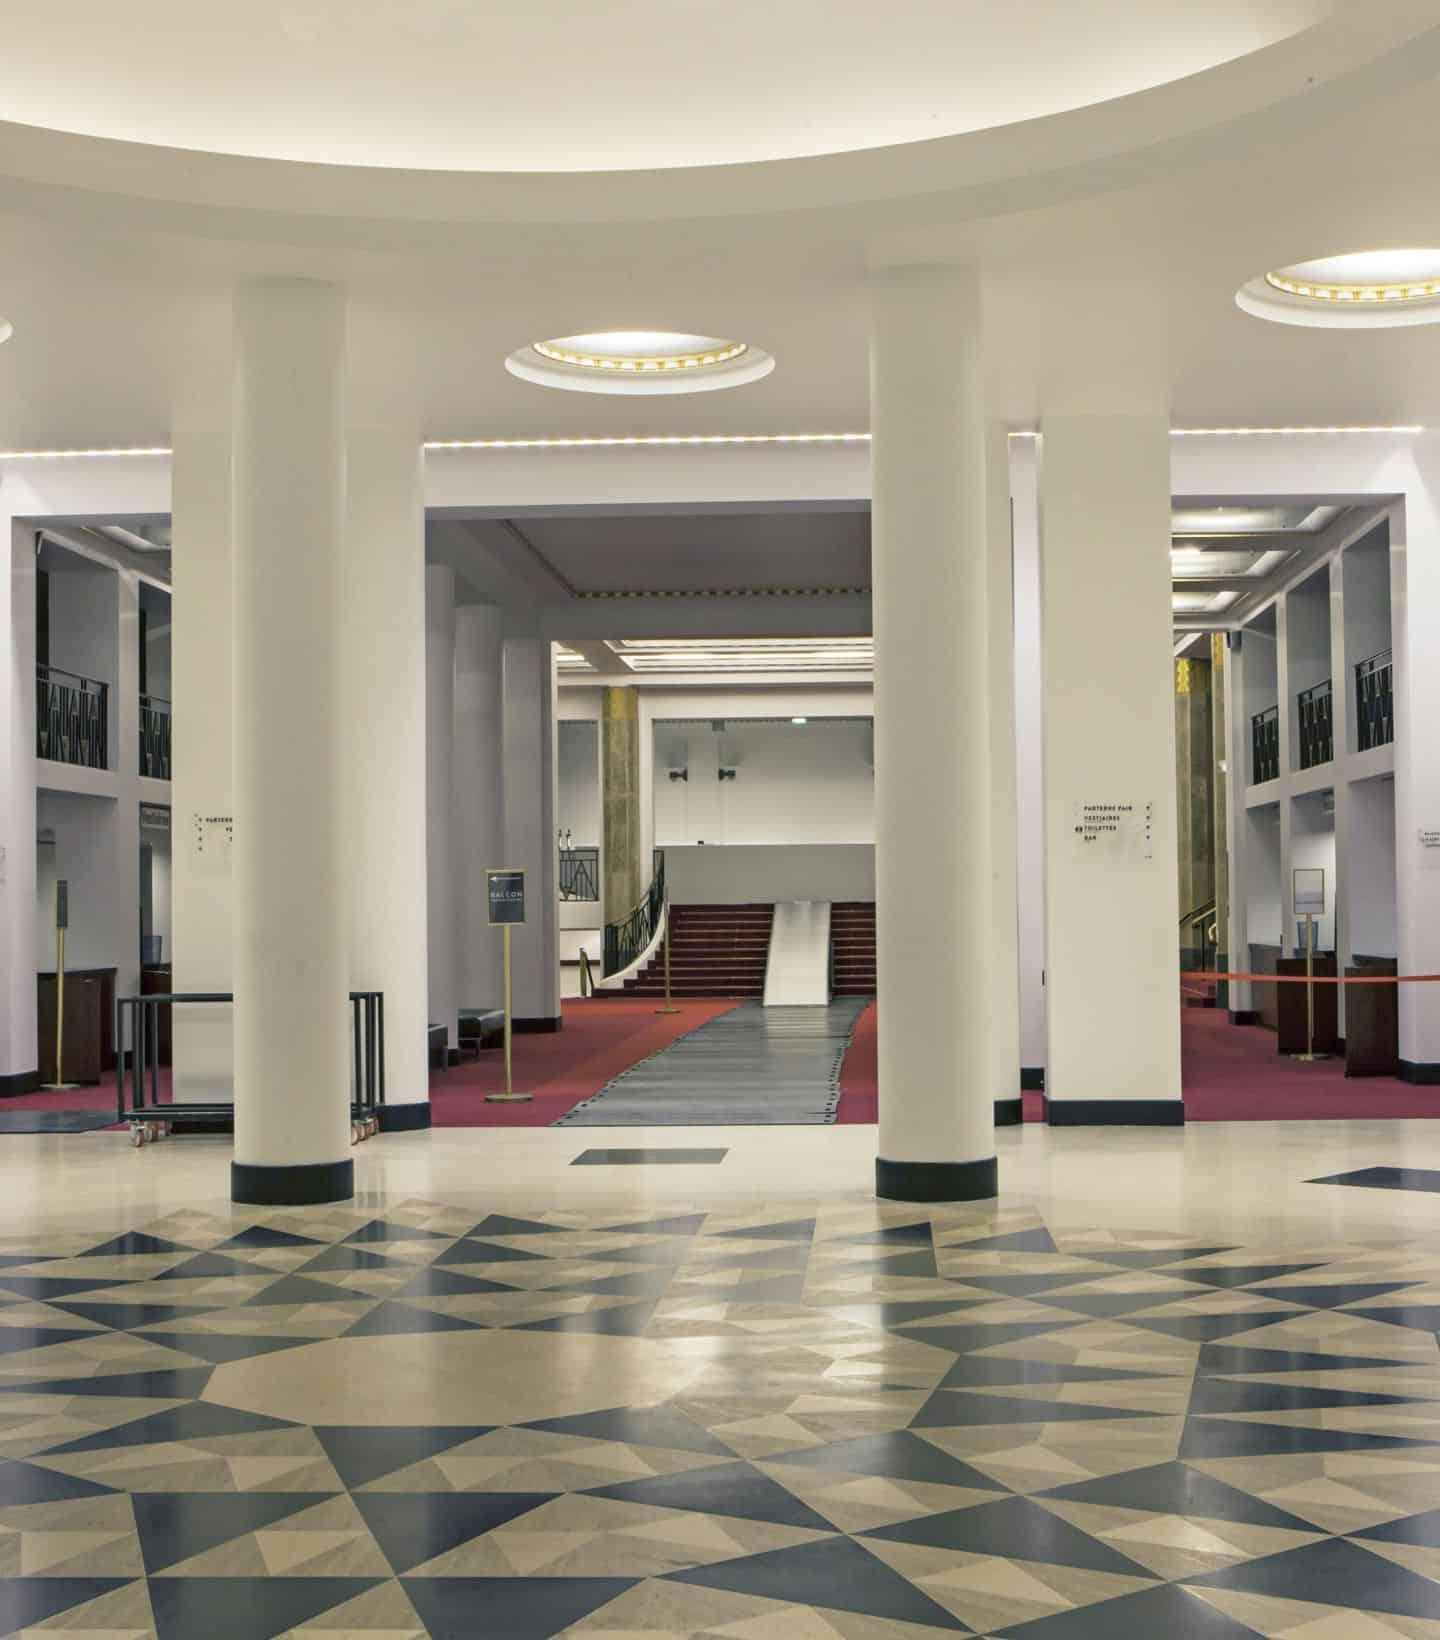 Salle Pleyel - DVVD